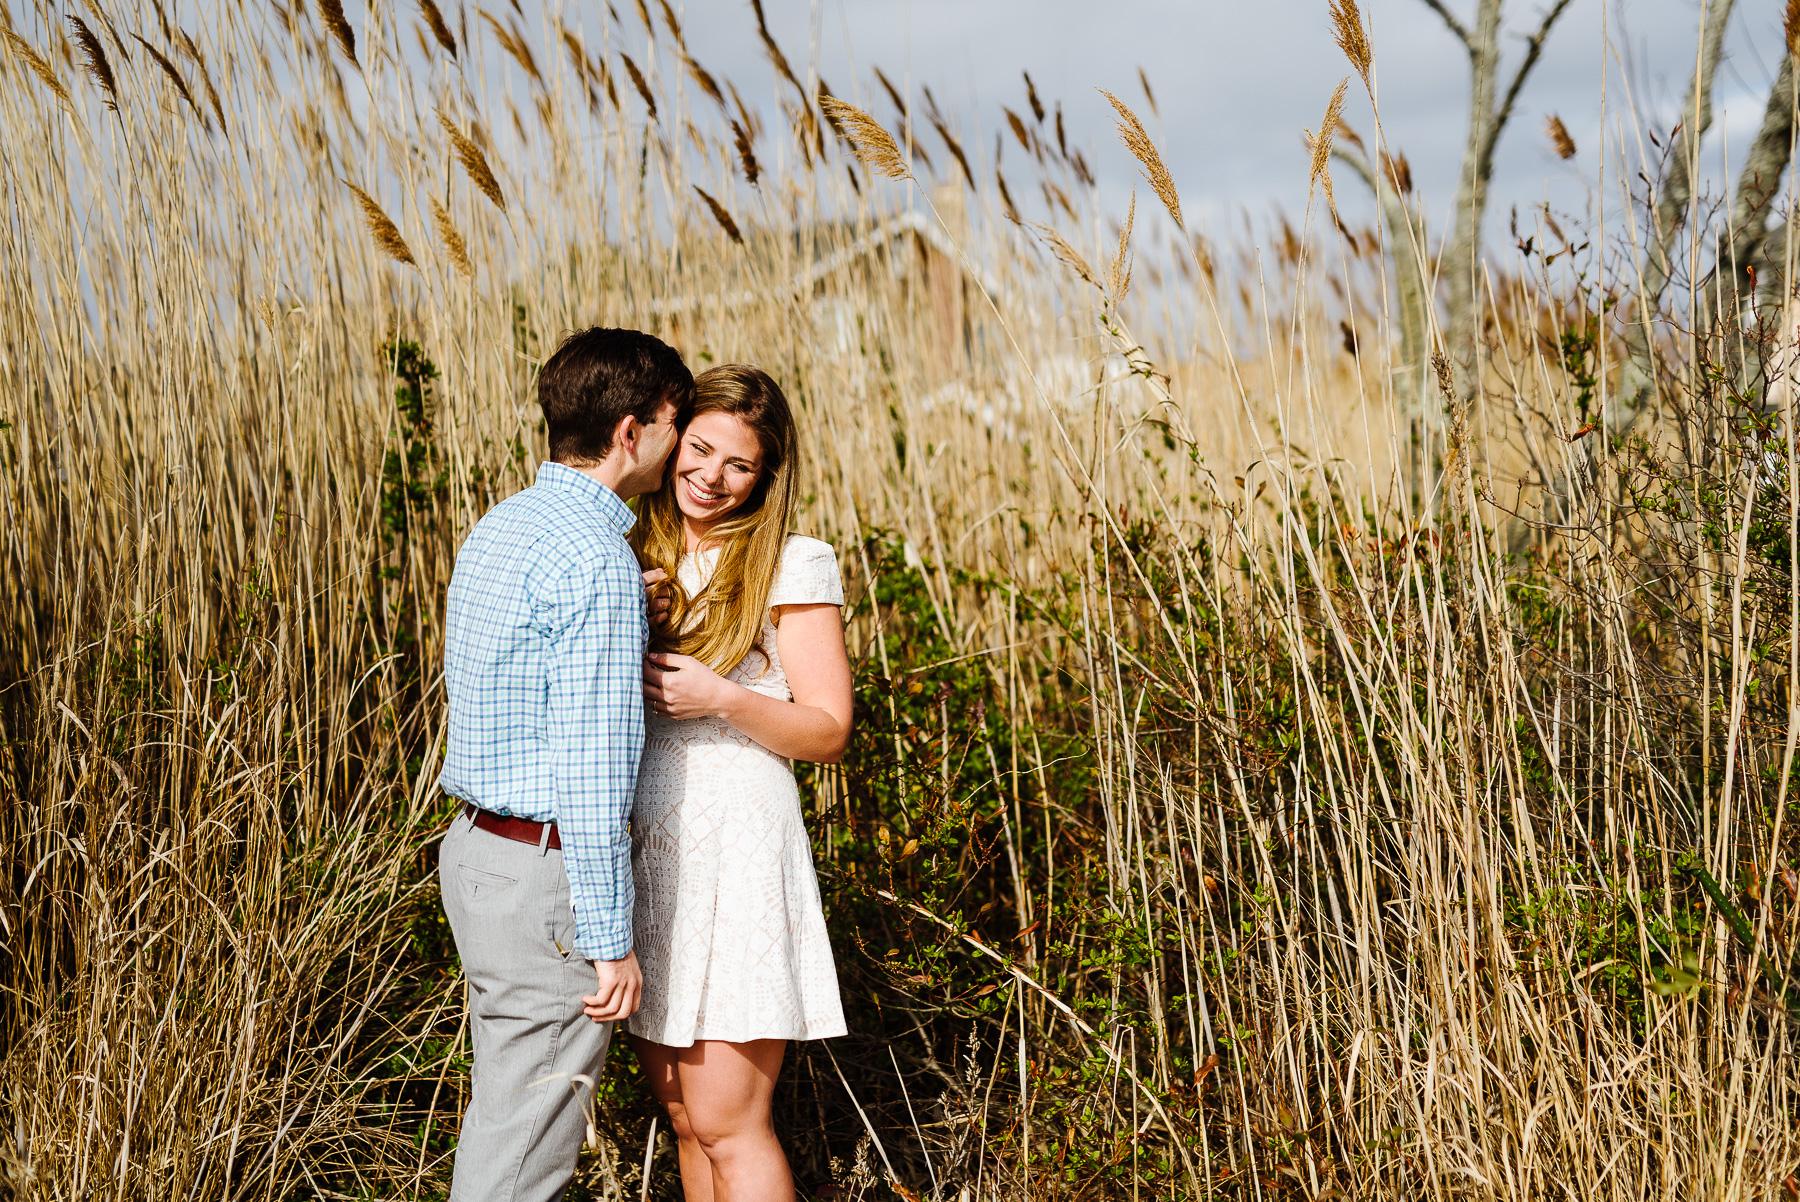 22-Bay Head NJ Engagement New Jersery Engagement Photographer NYC Engagements Brooklyn Engagement Photos Longbrook Photography.jpg